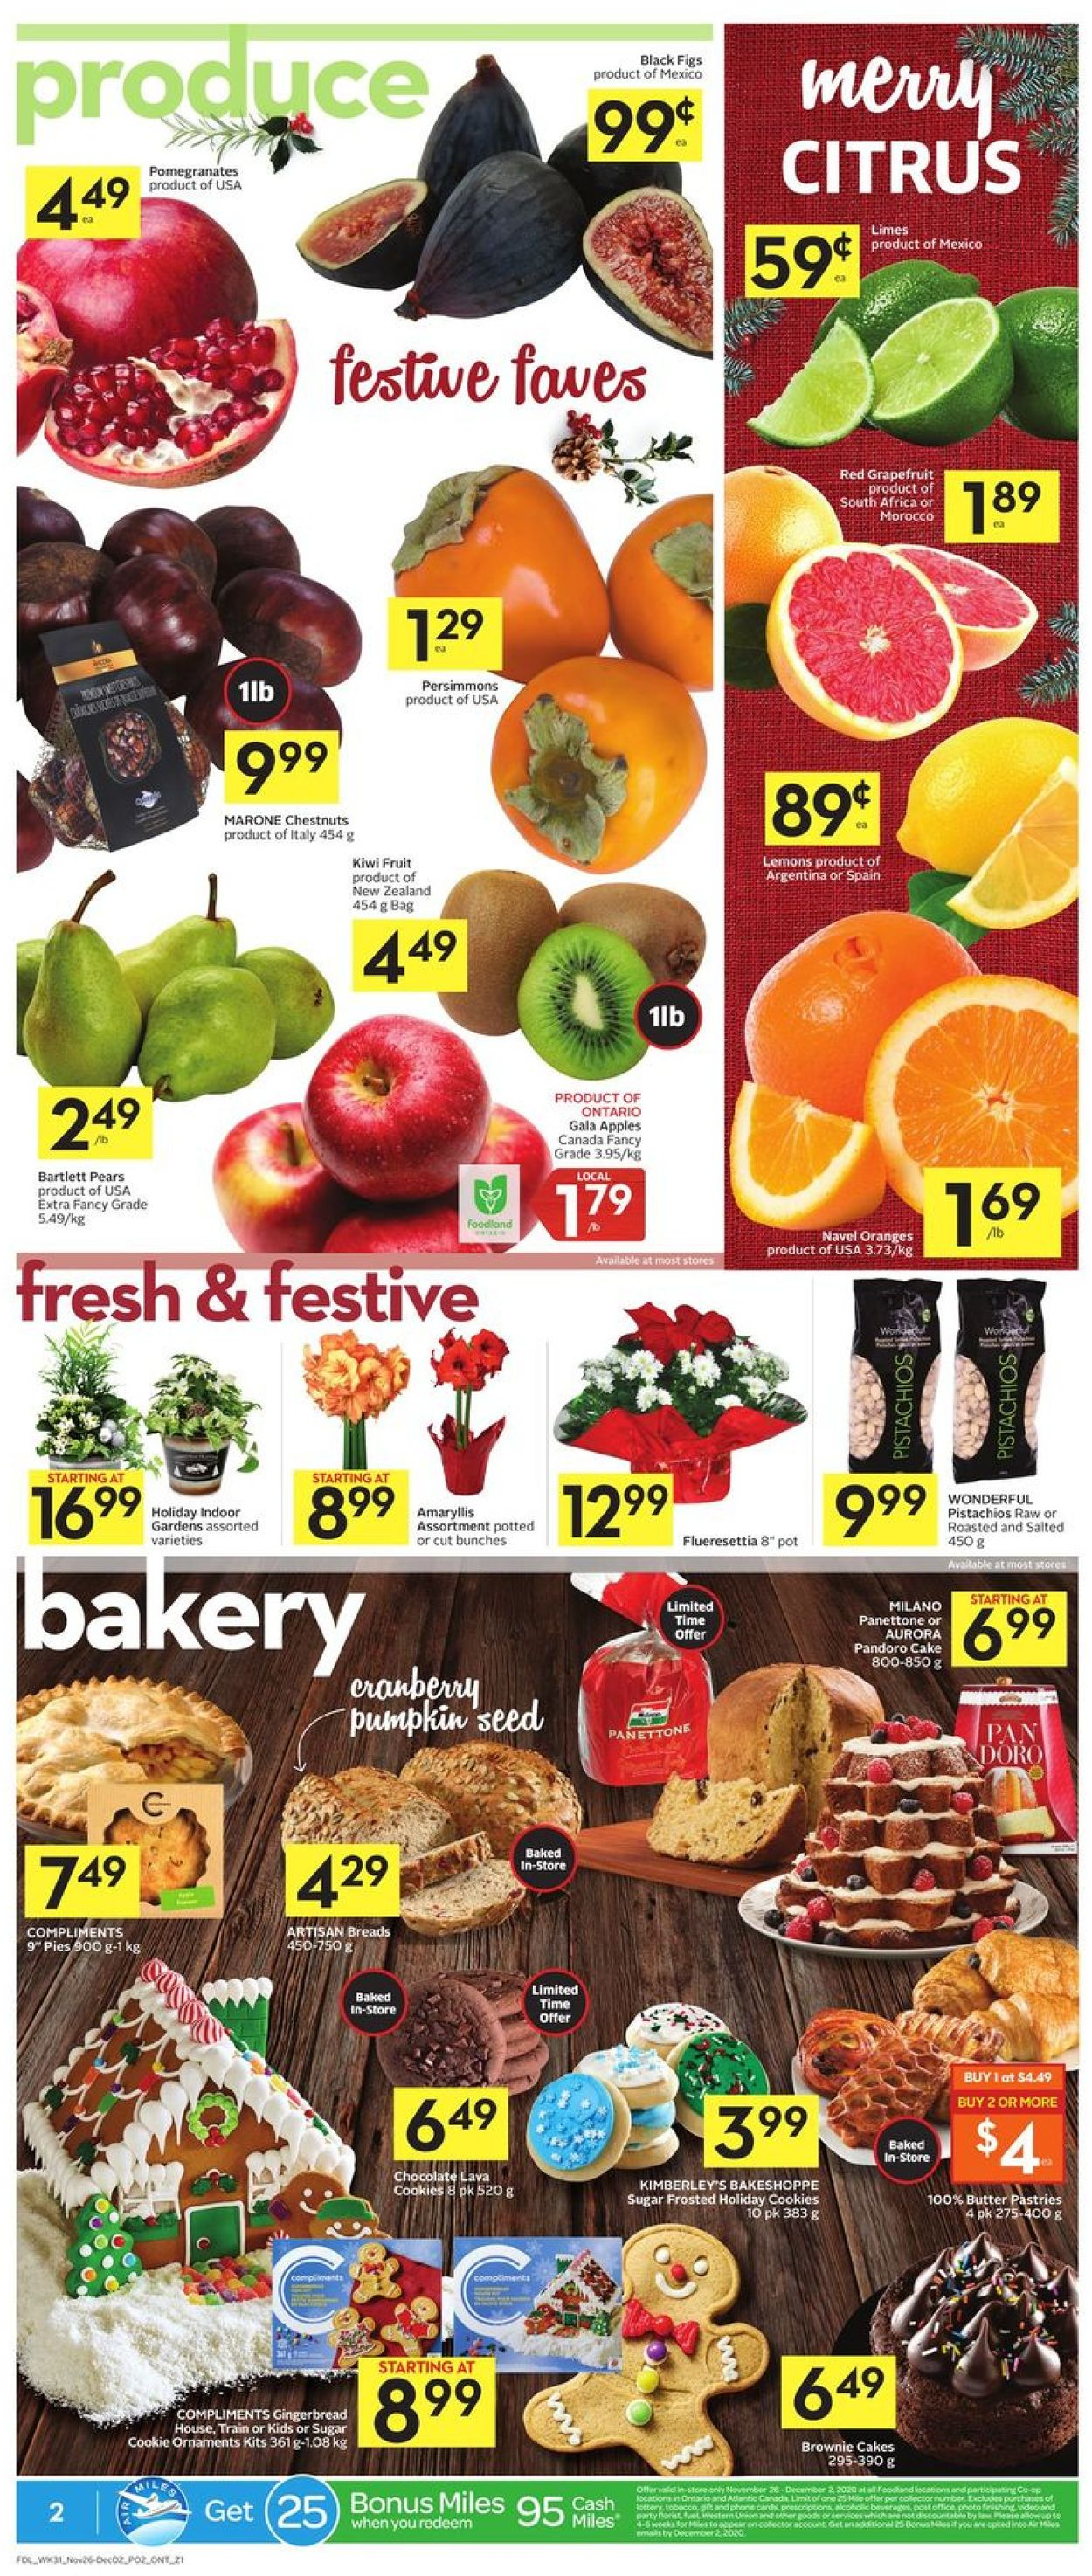 Foodland - Black Friday 2020 Flyer - 11/26-12/02/2020 (Page 2)